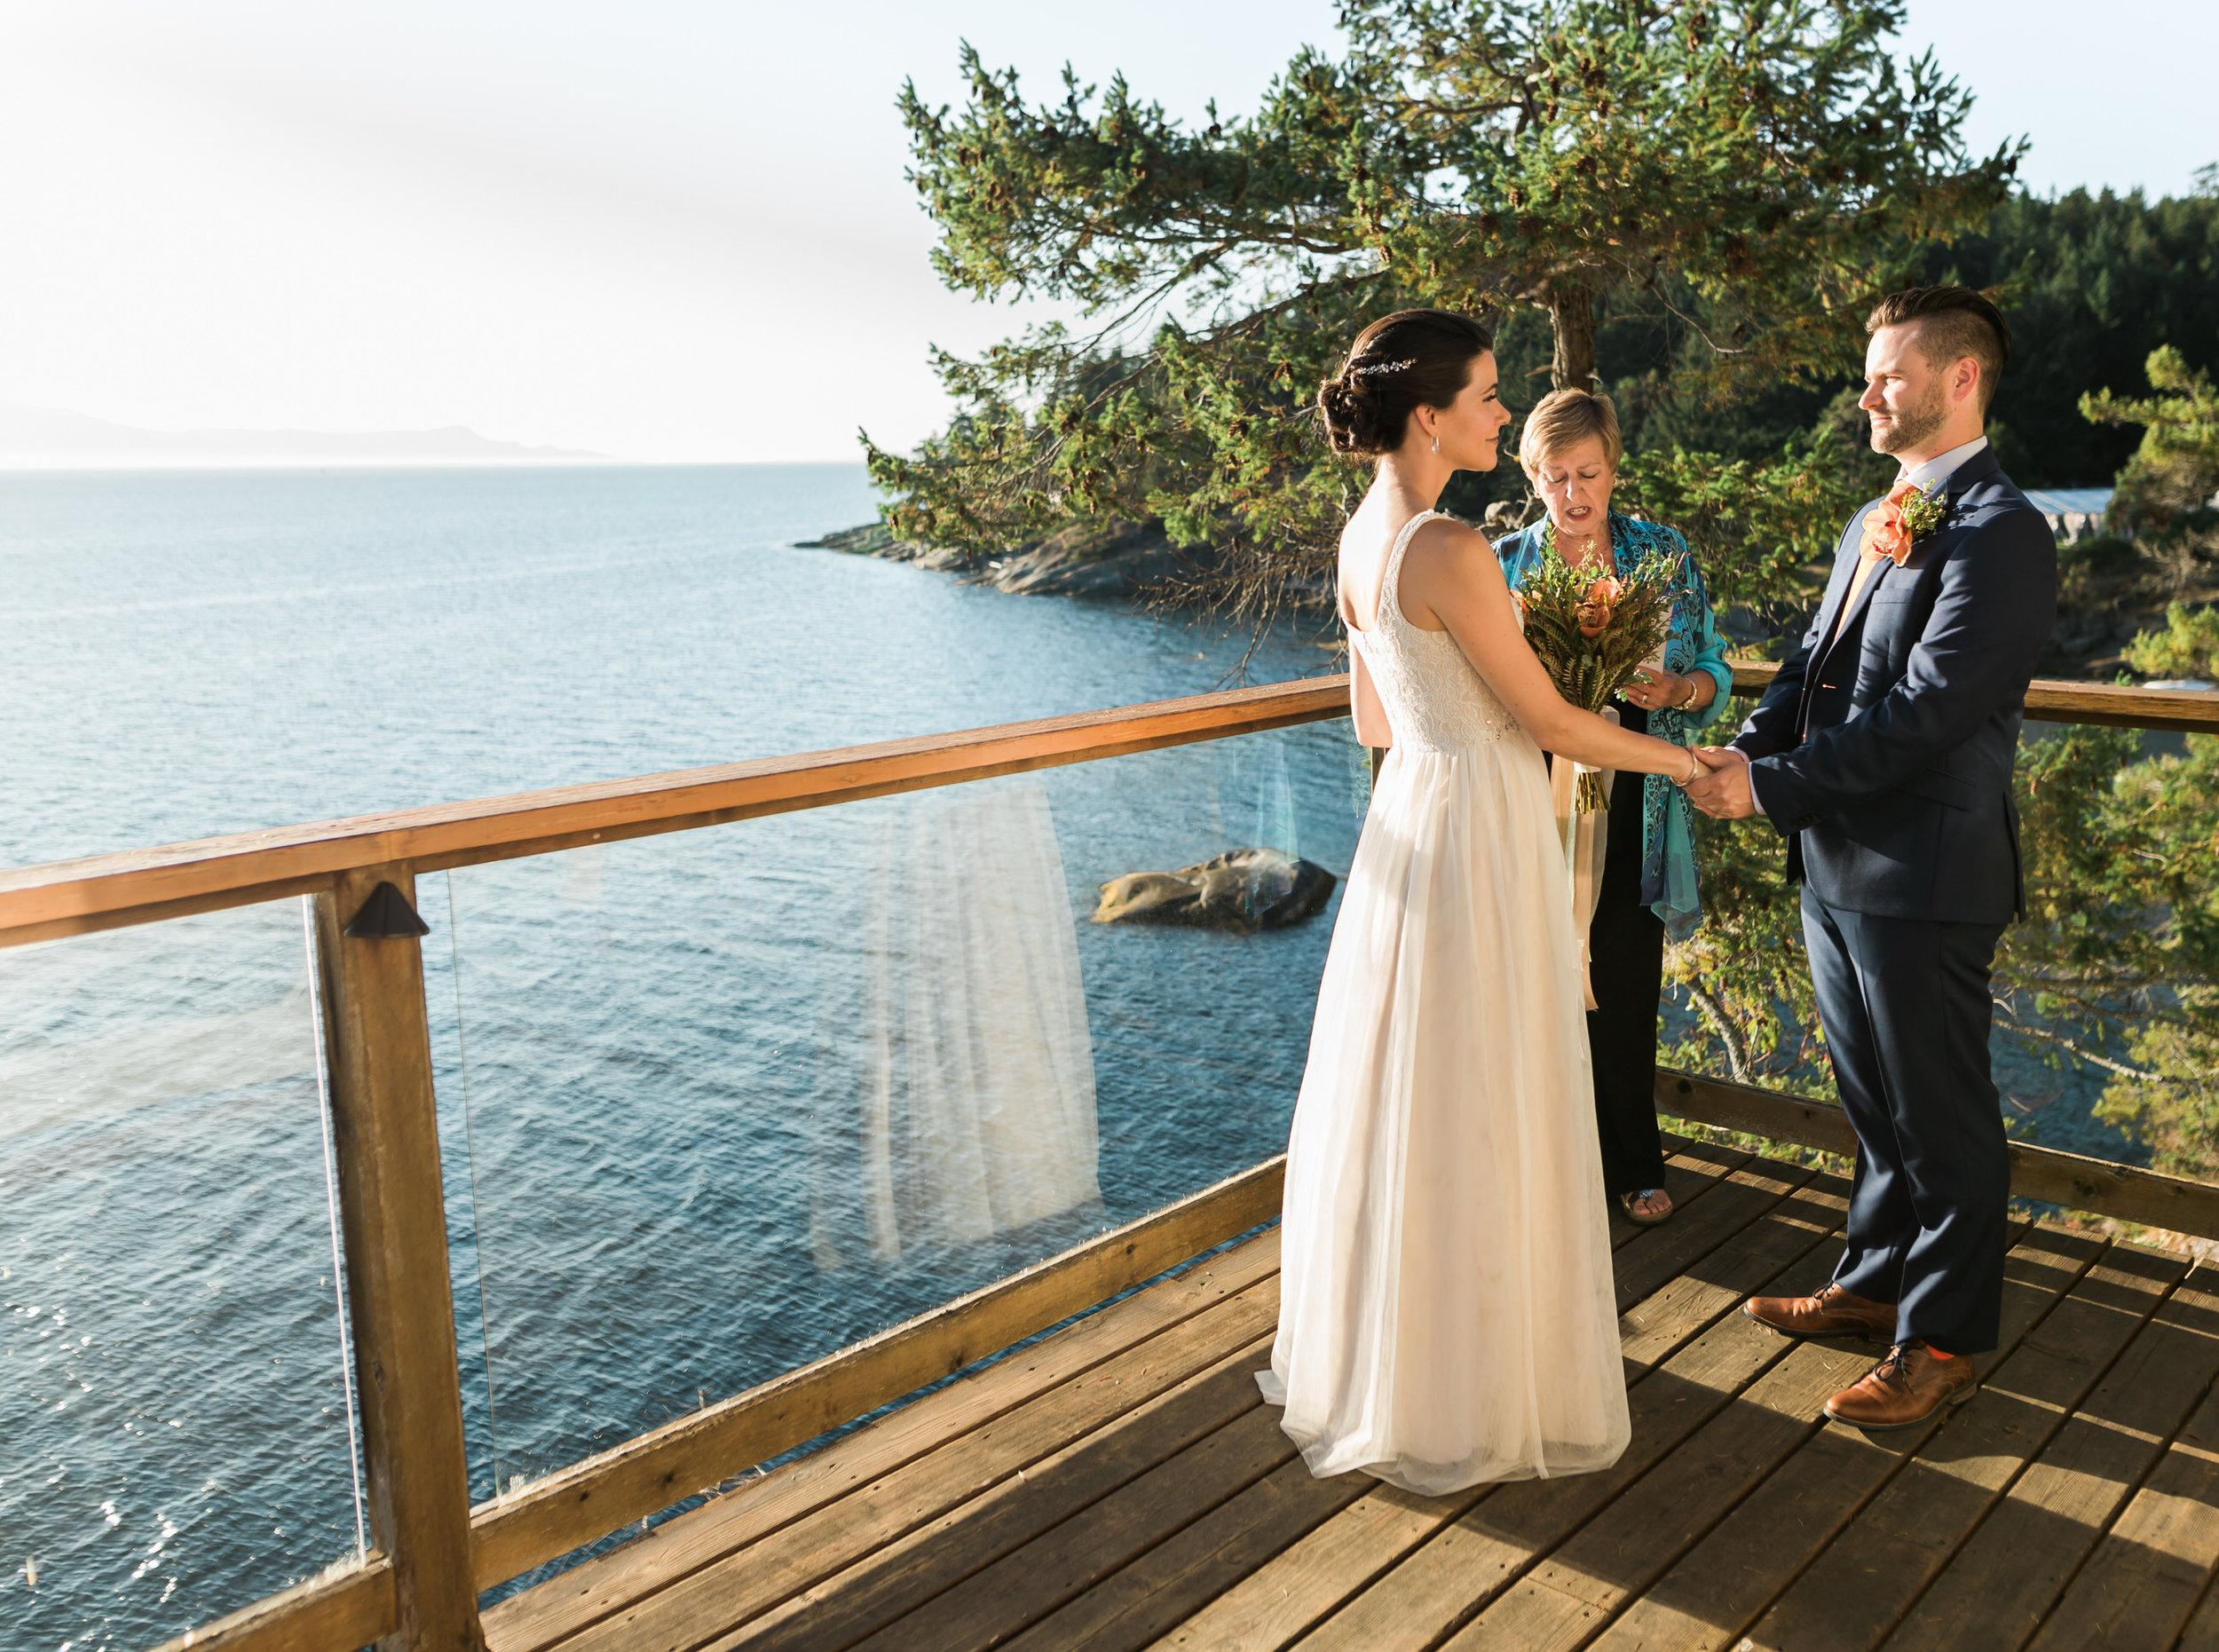 Rockwater Secret Cove Resort Wedding - Sunshine Coast BC Wedding Photographer - Vancouver Wedding Photographer - Sunshine Coast Elopement Photos - IMG_0406.jpg